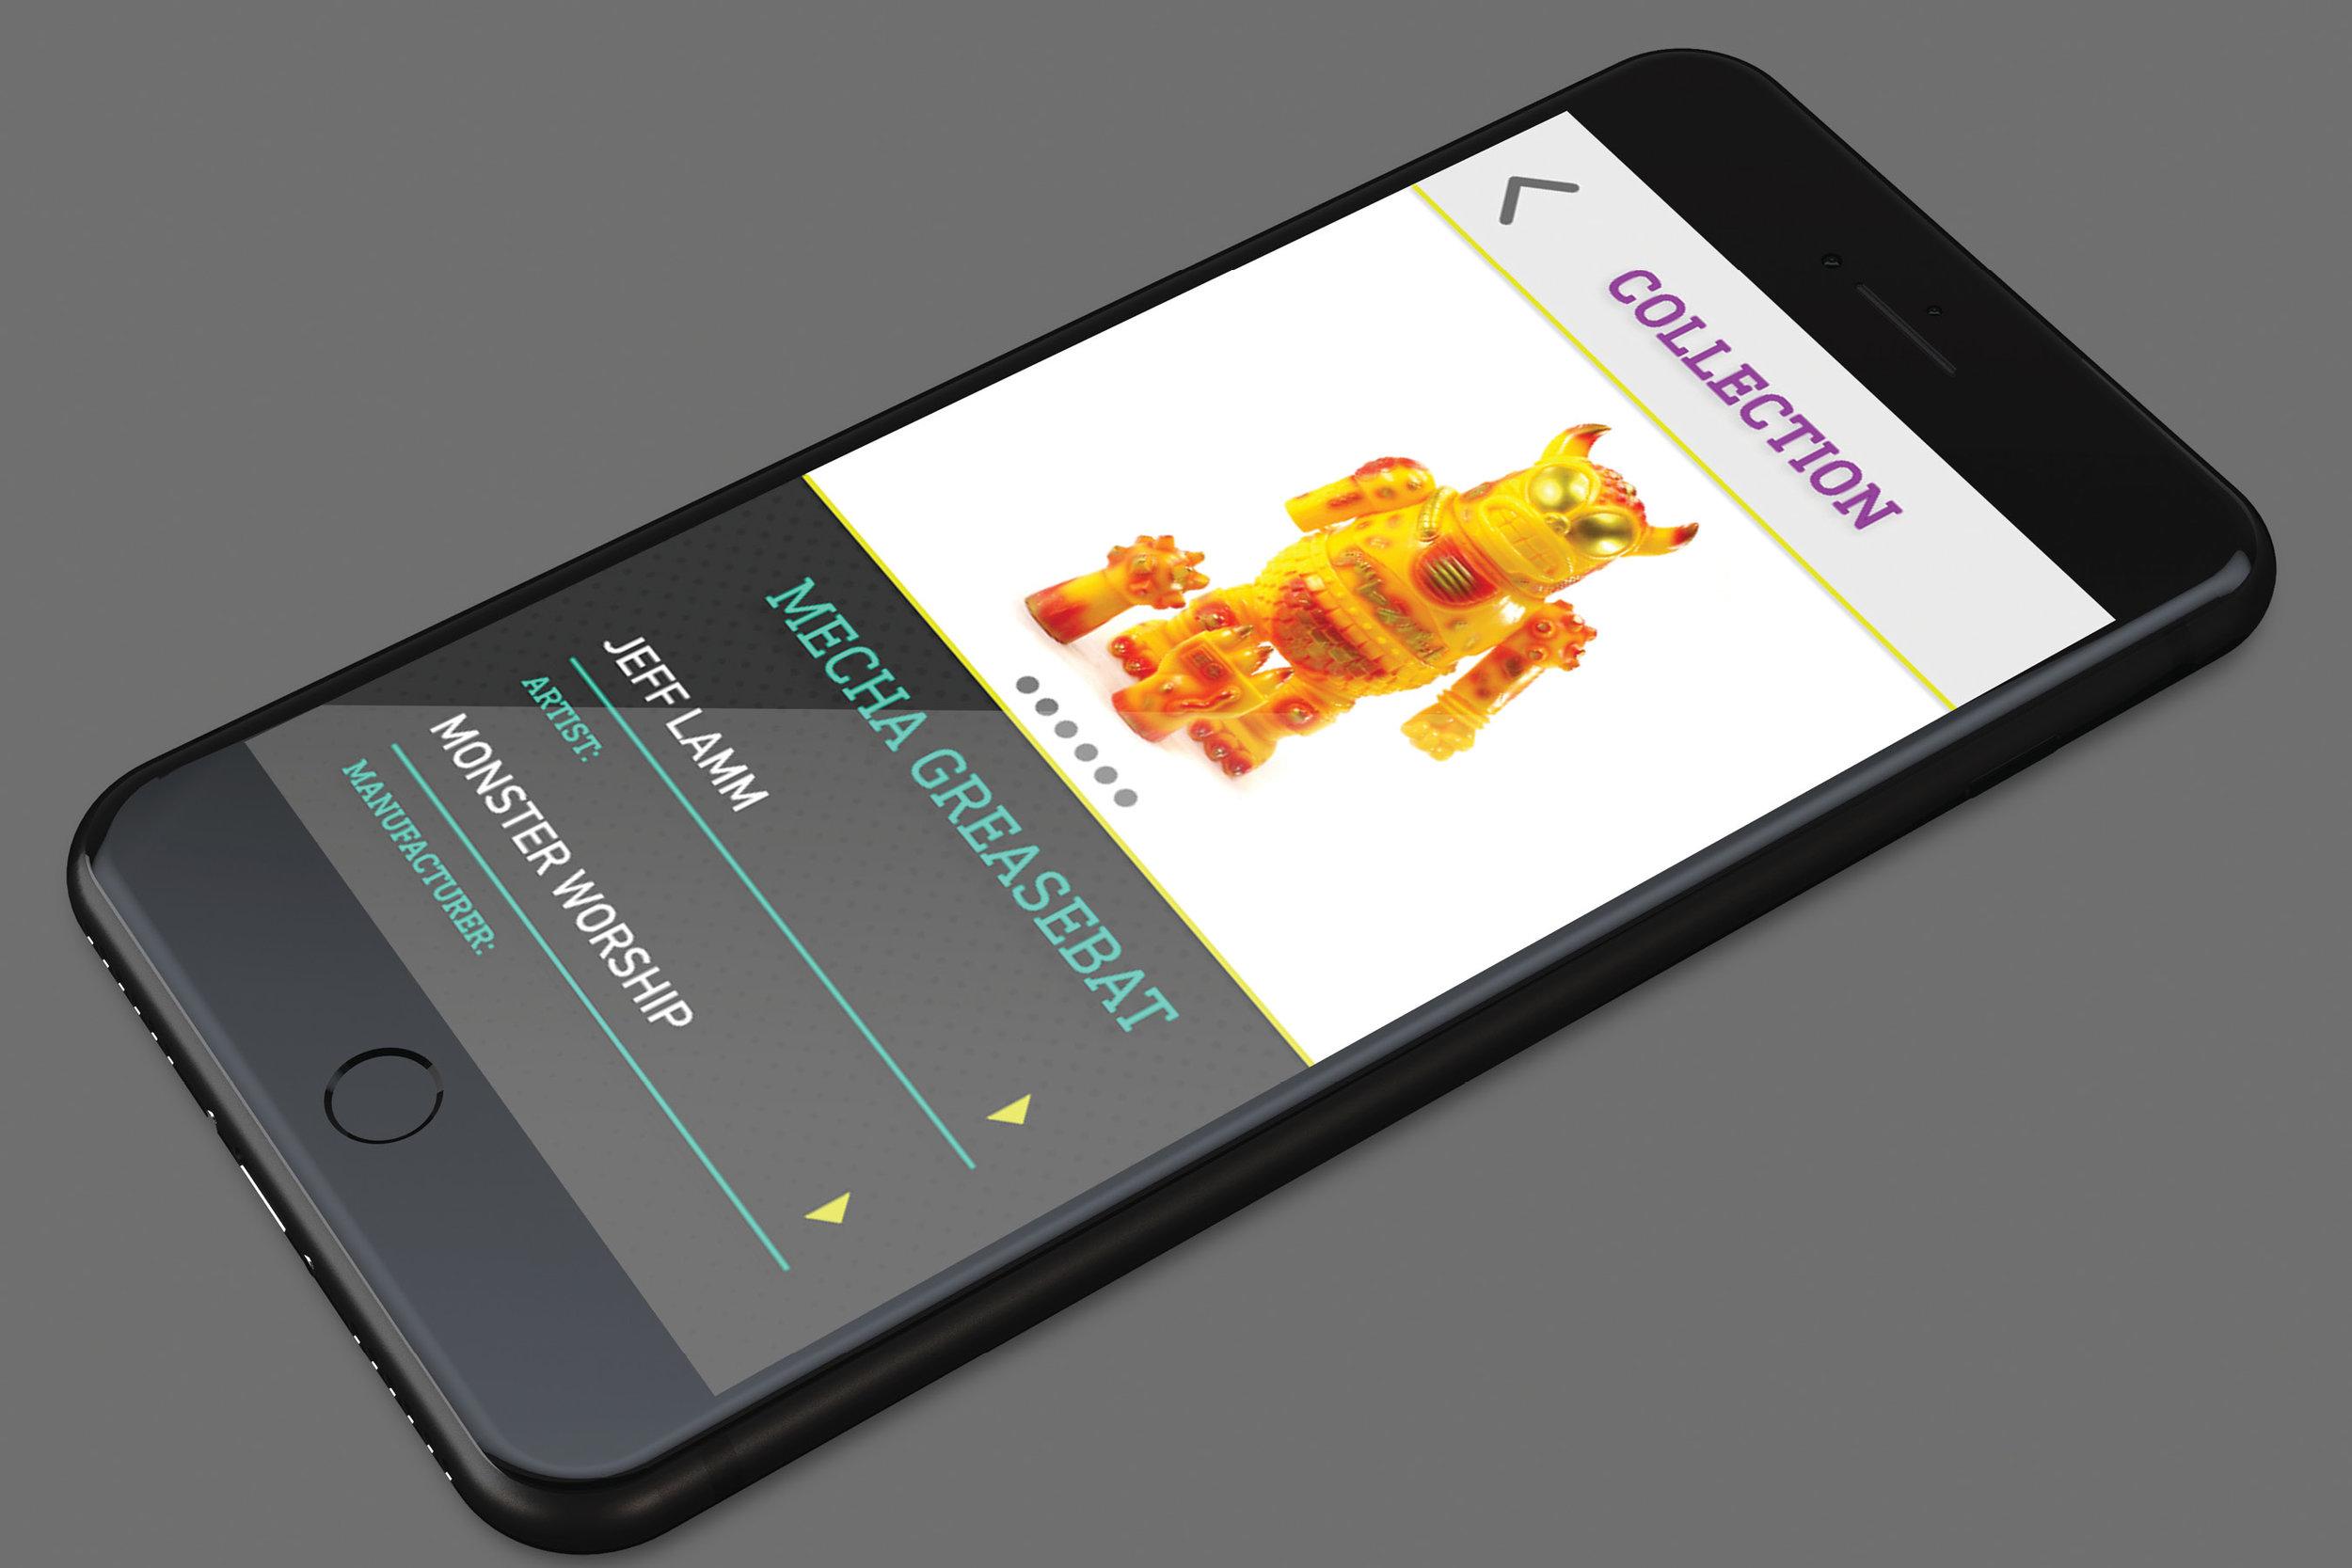 phone_app6.jpg